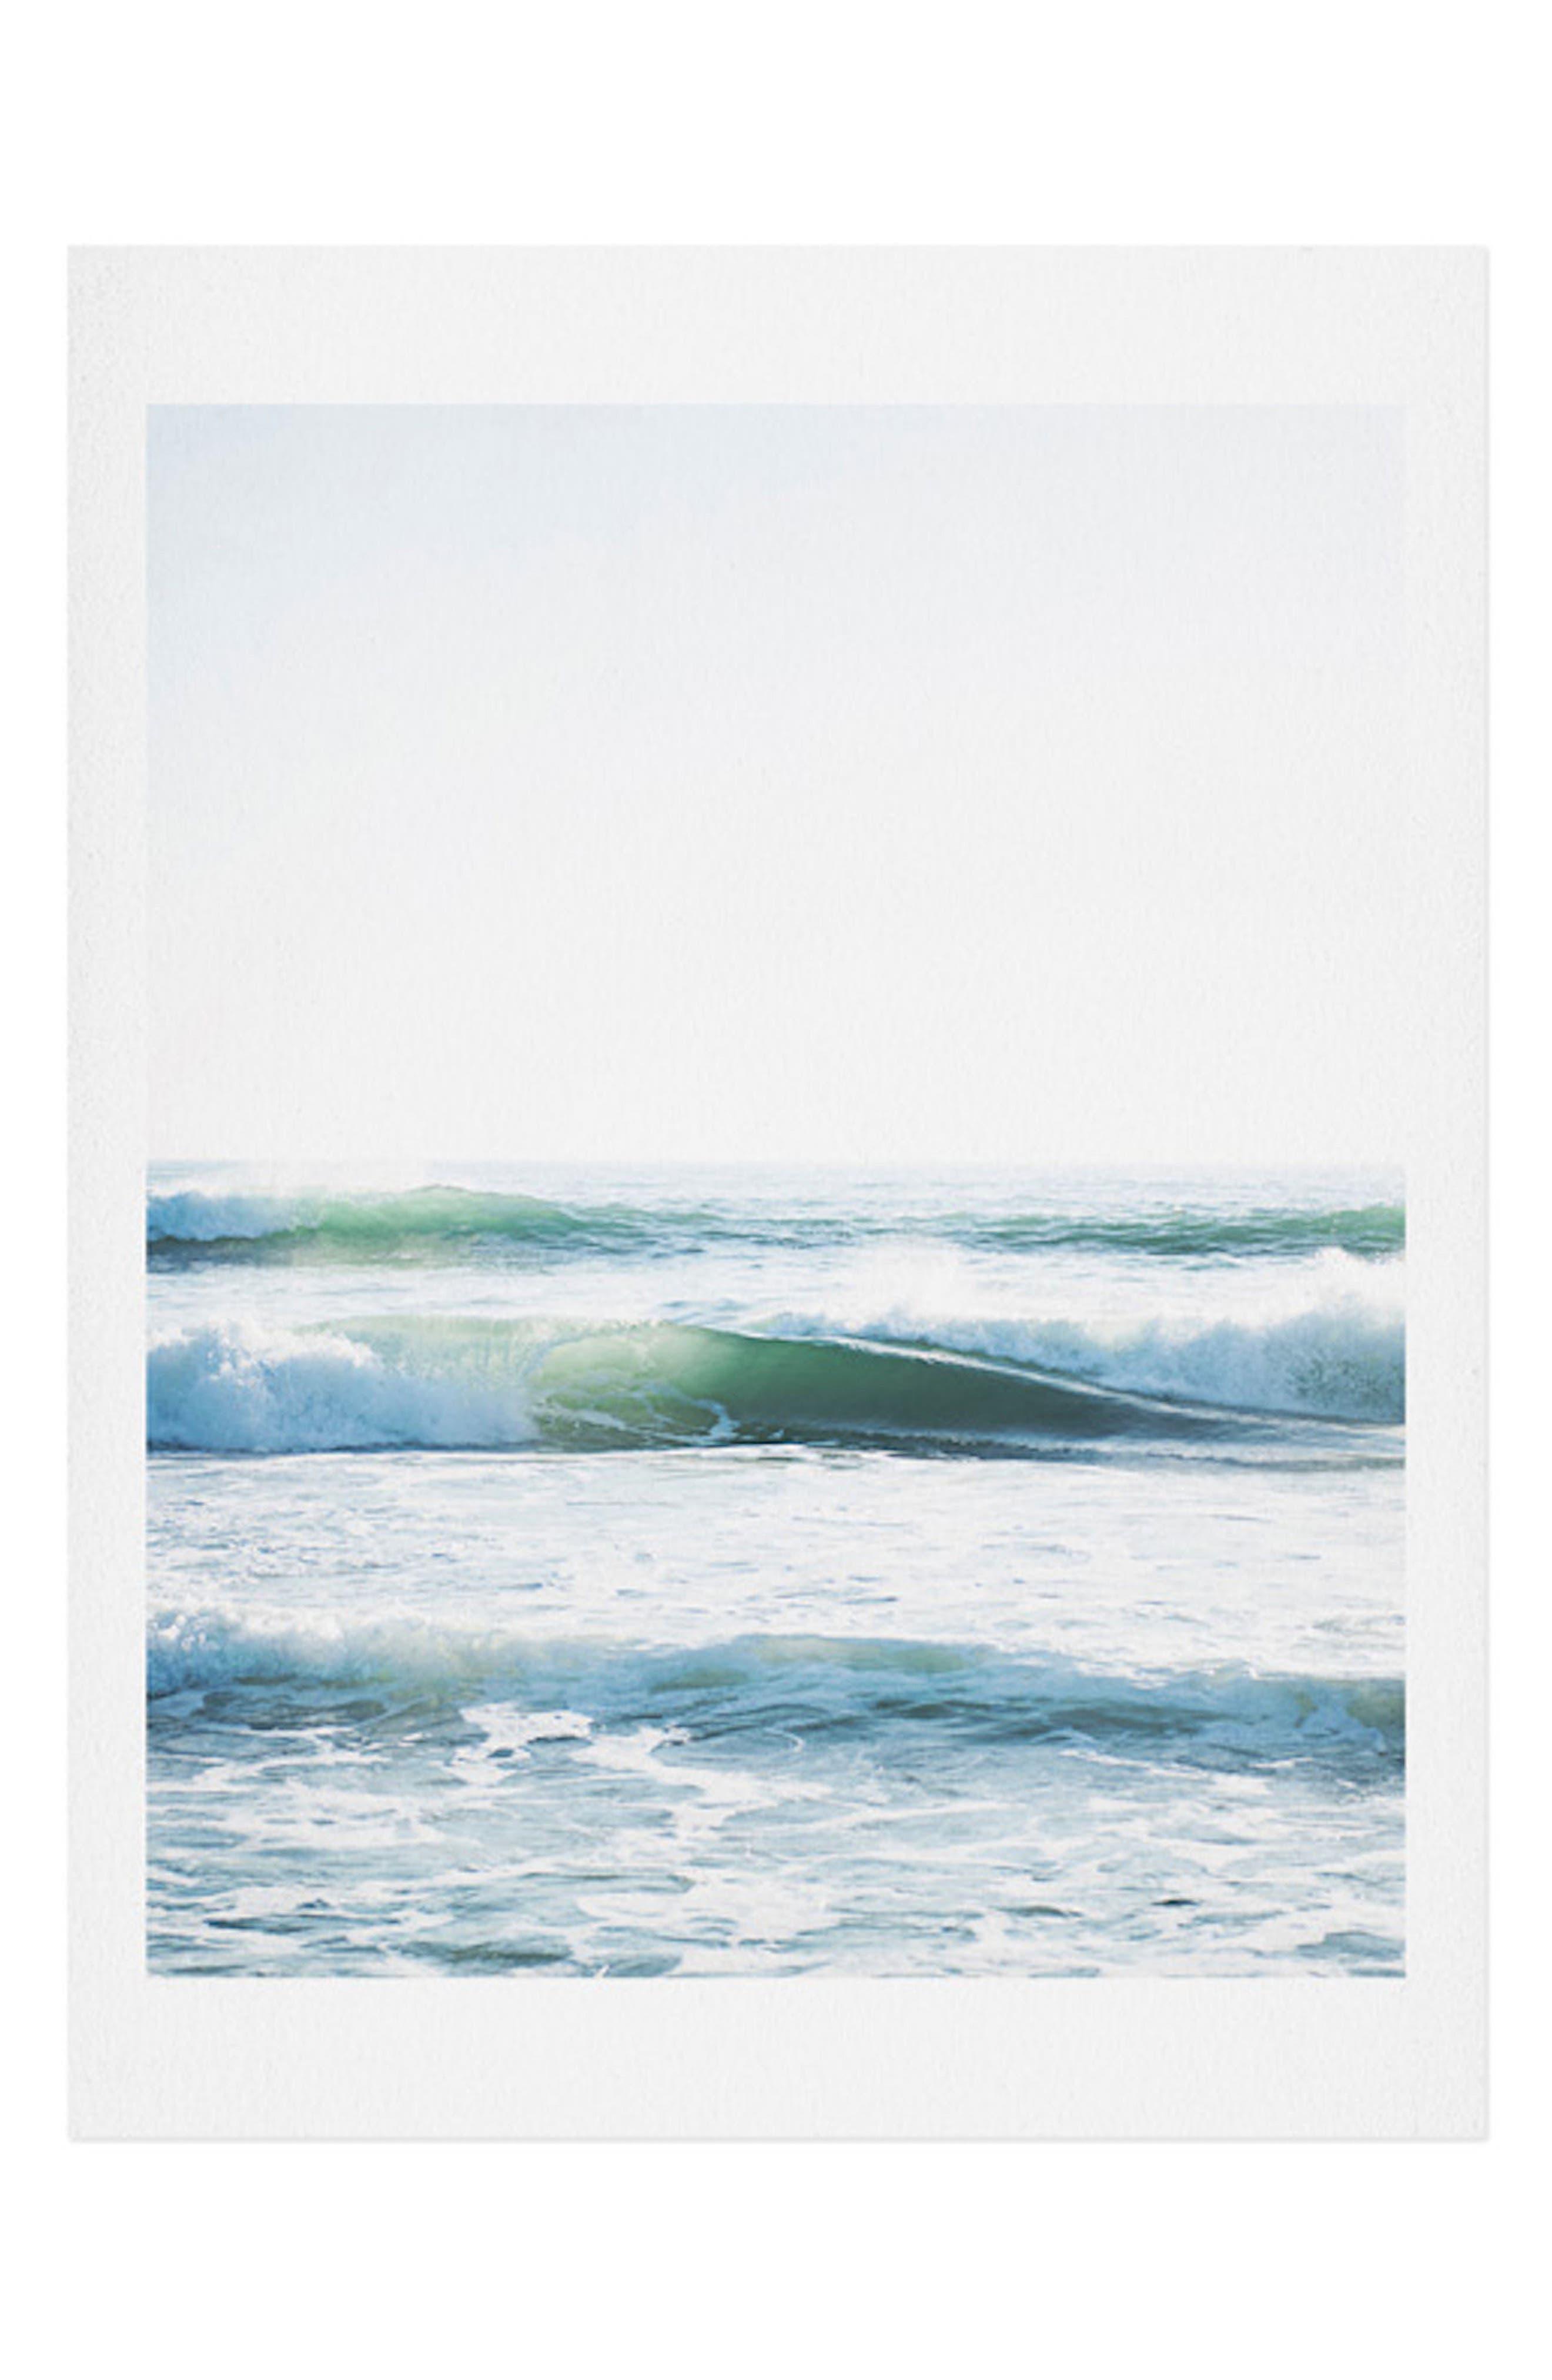 DENY DESIGNS Bree Madden - Ride Waves Art Print, Main, color, BLUE